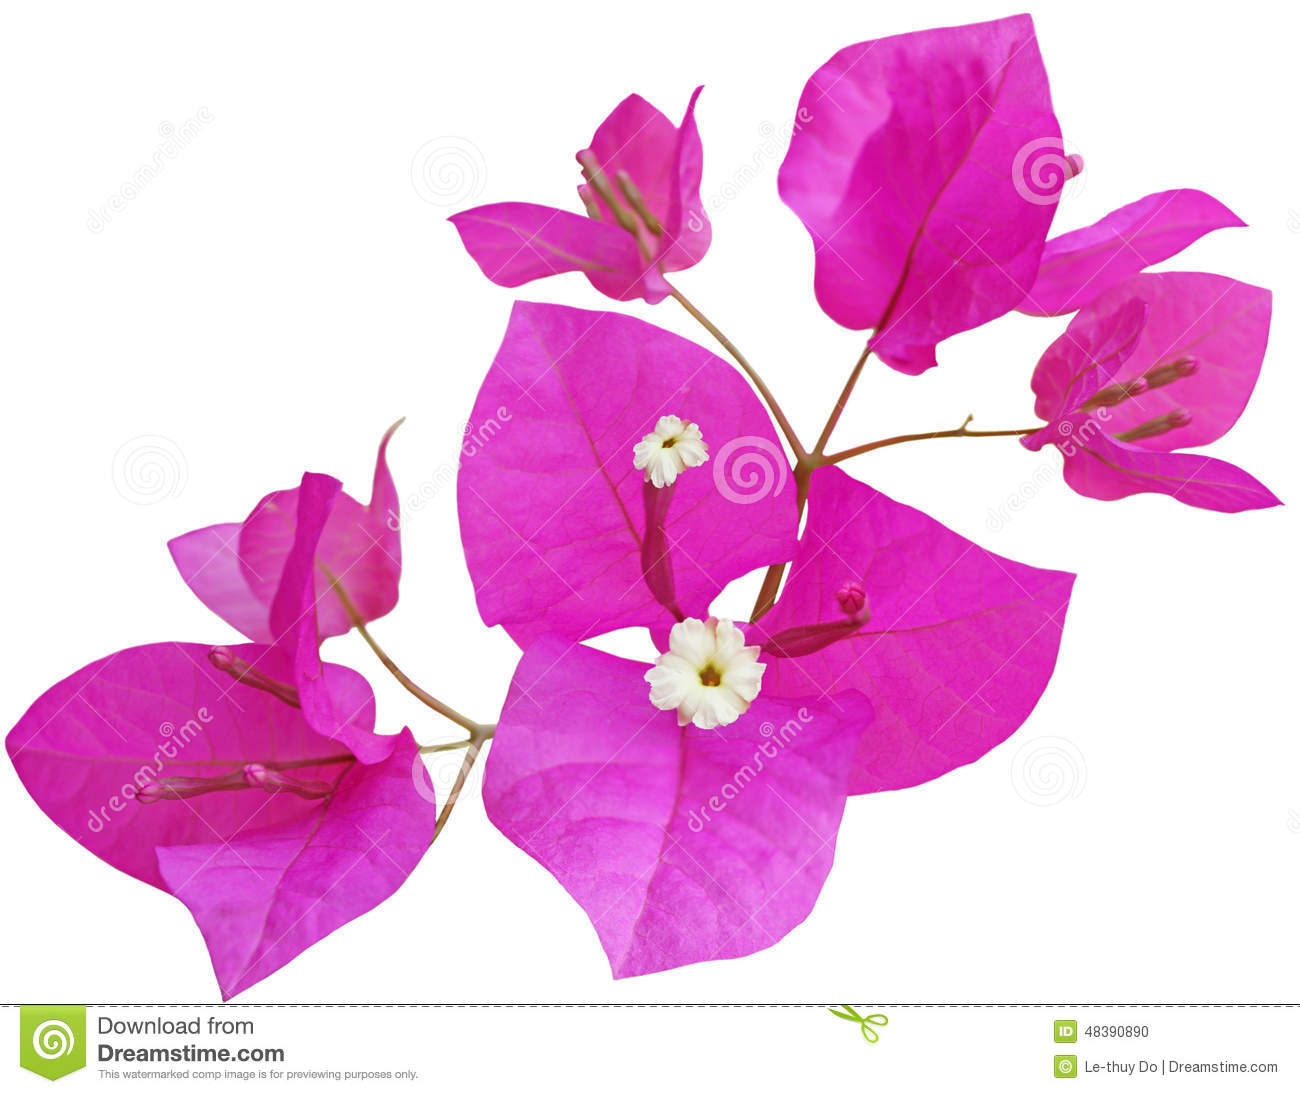 bougainvillea flowers clipart